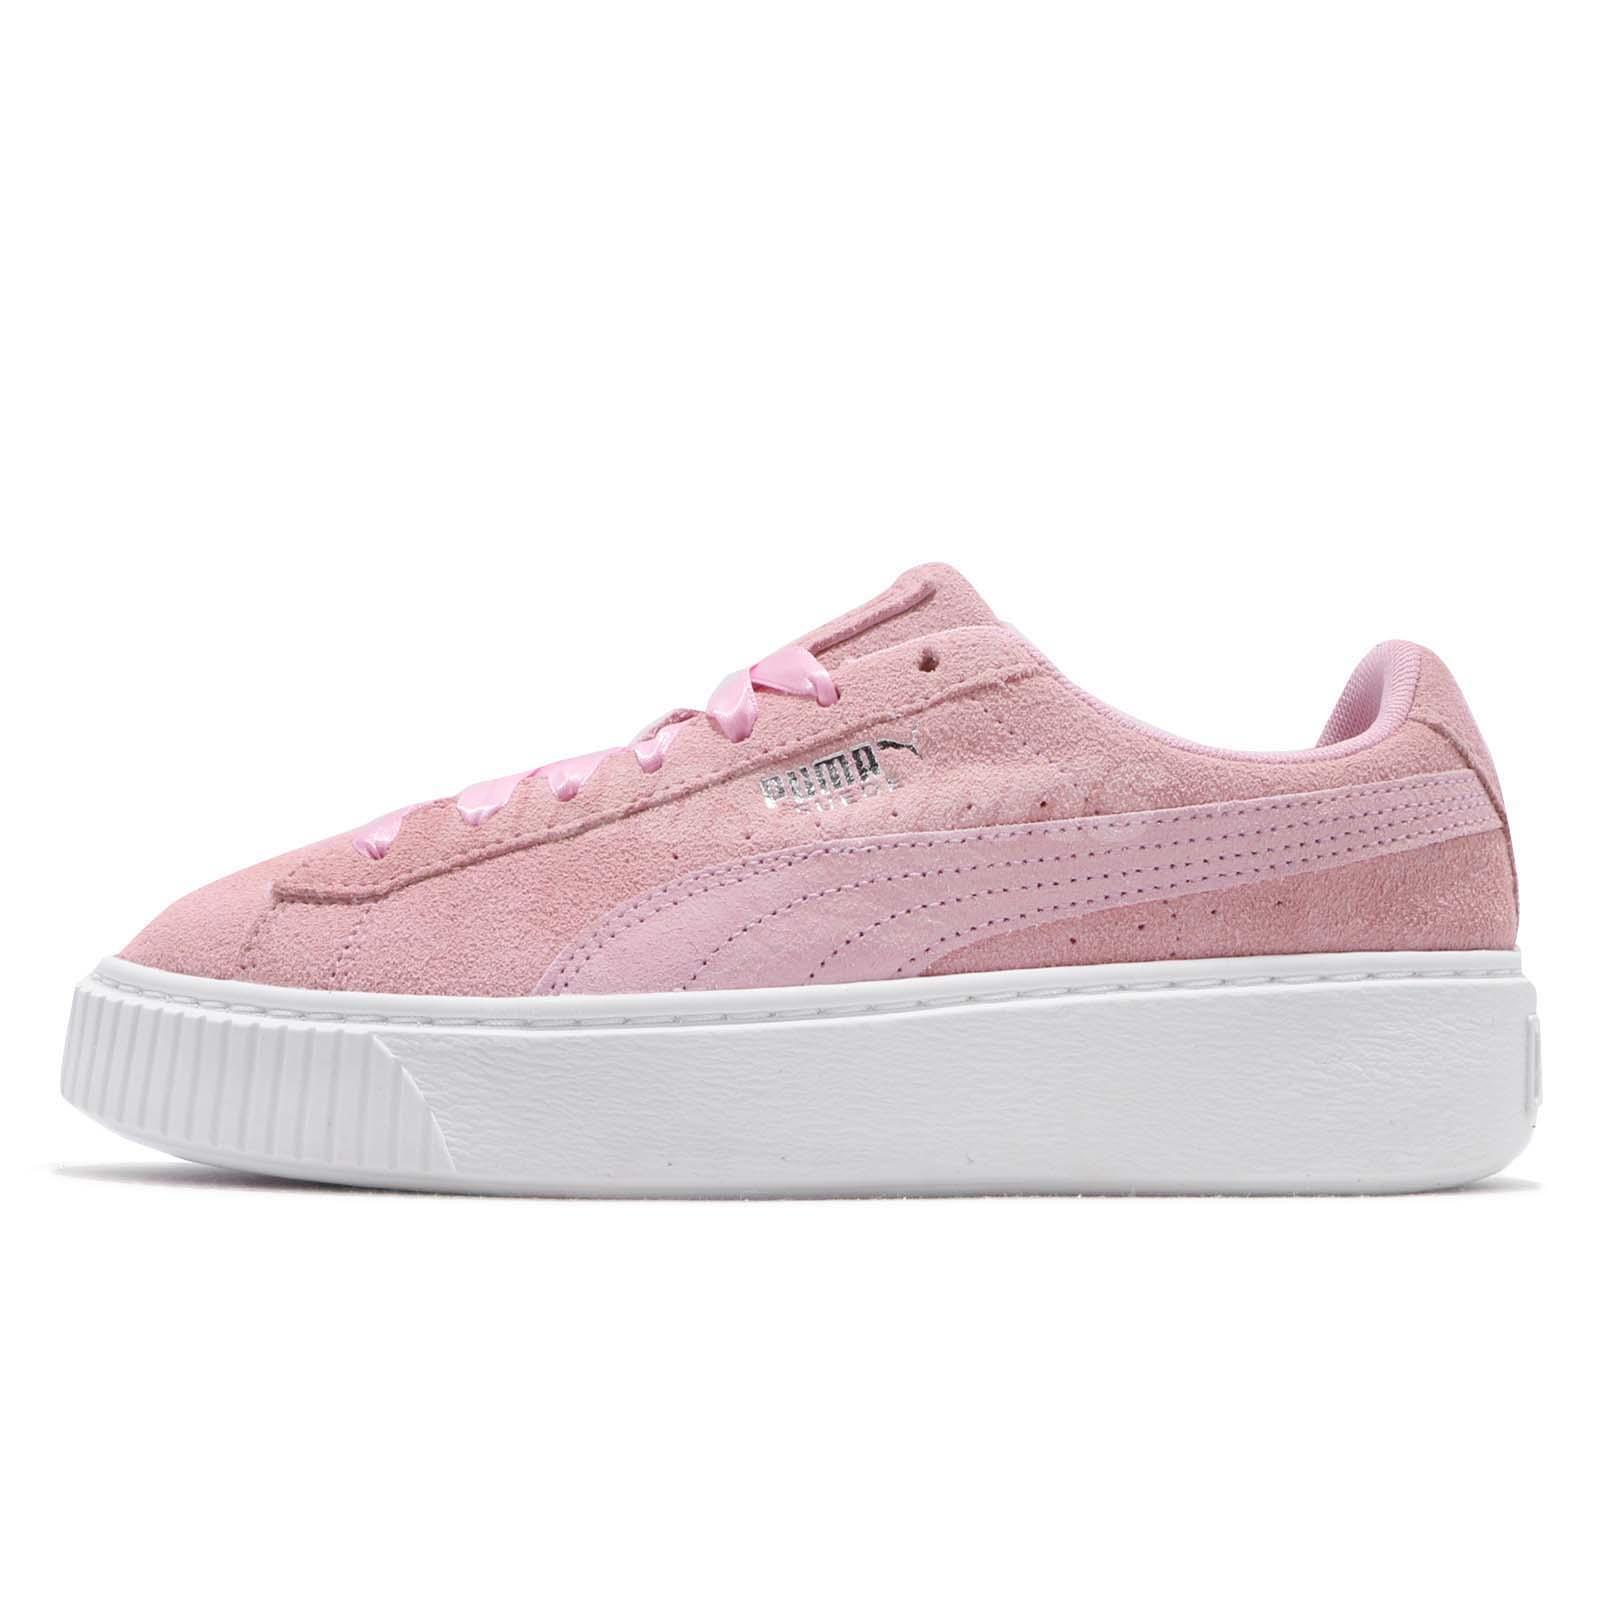 0bc924251e Details about Puma Platform Galaxy Wns Pale Pink Silver White Women Casual  Shoes 369172-01